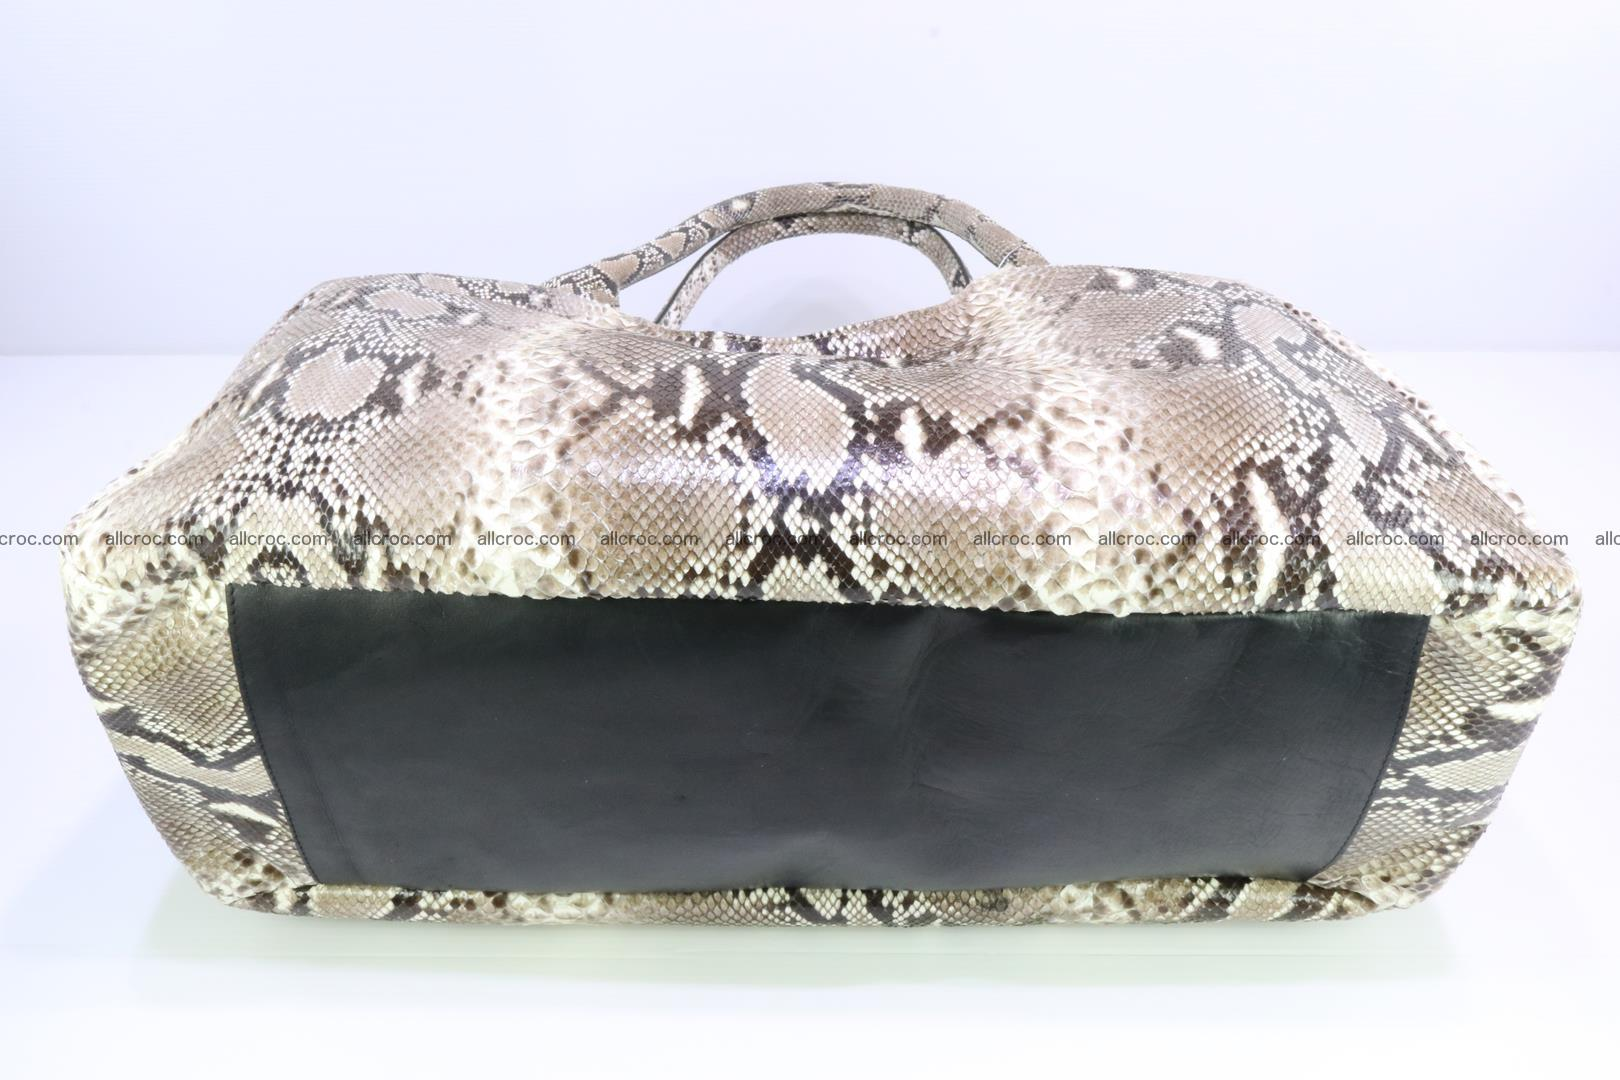 Python skin handbag for lady from genuine Python skin 197 Foto 5